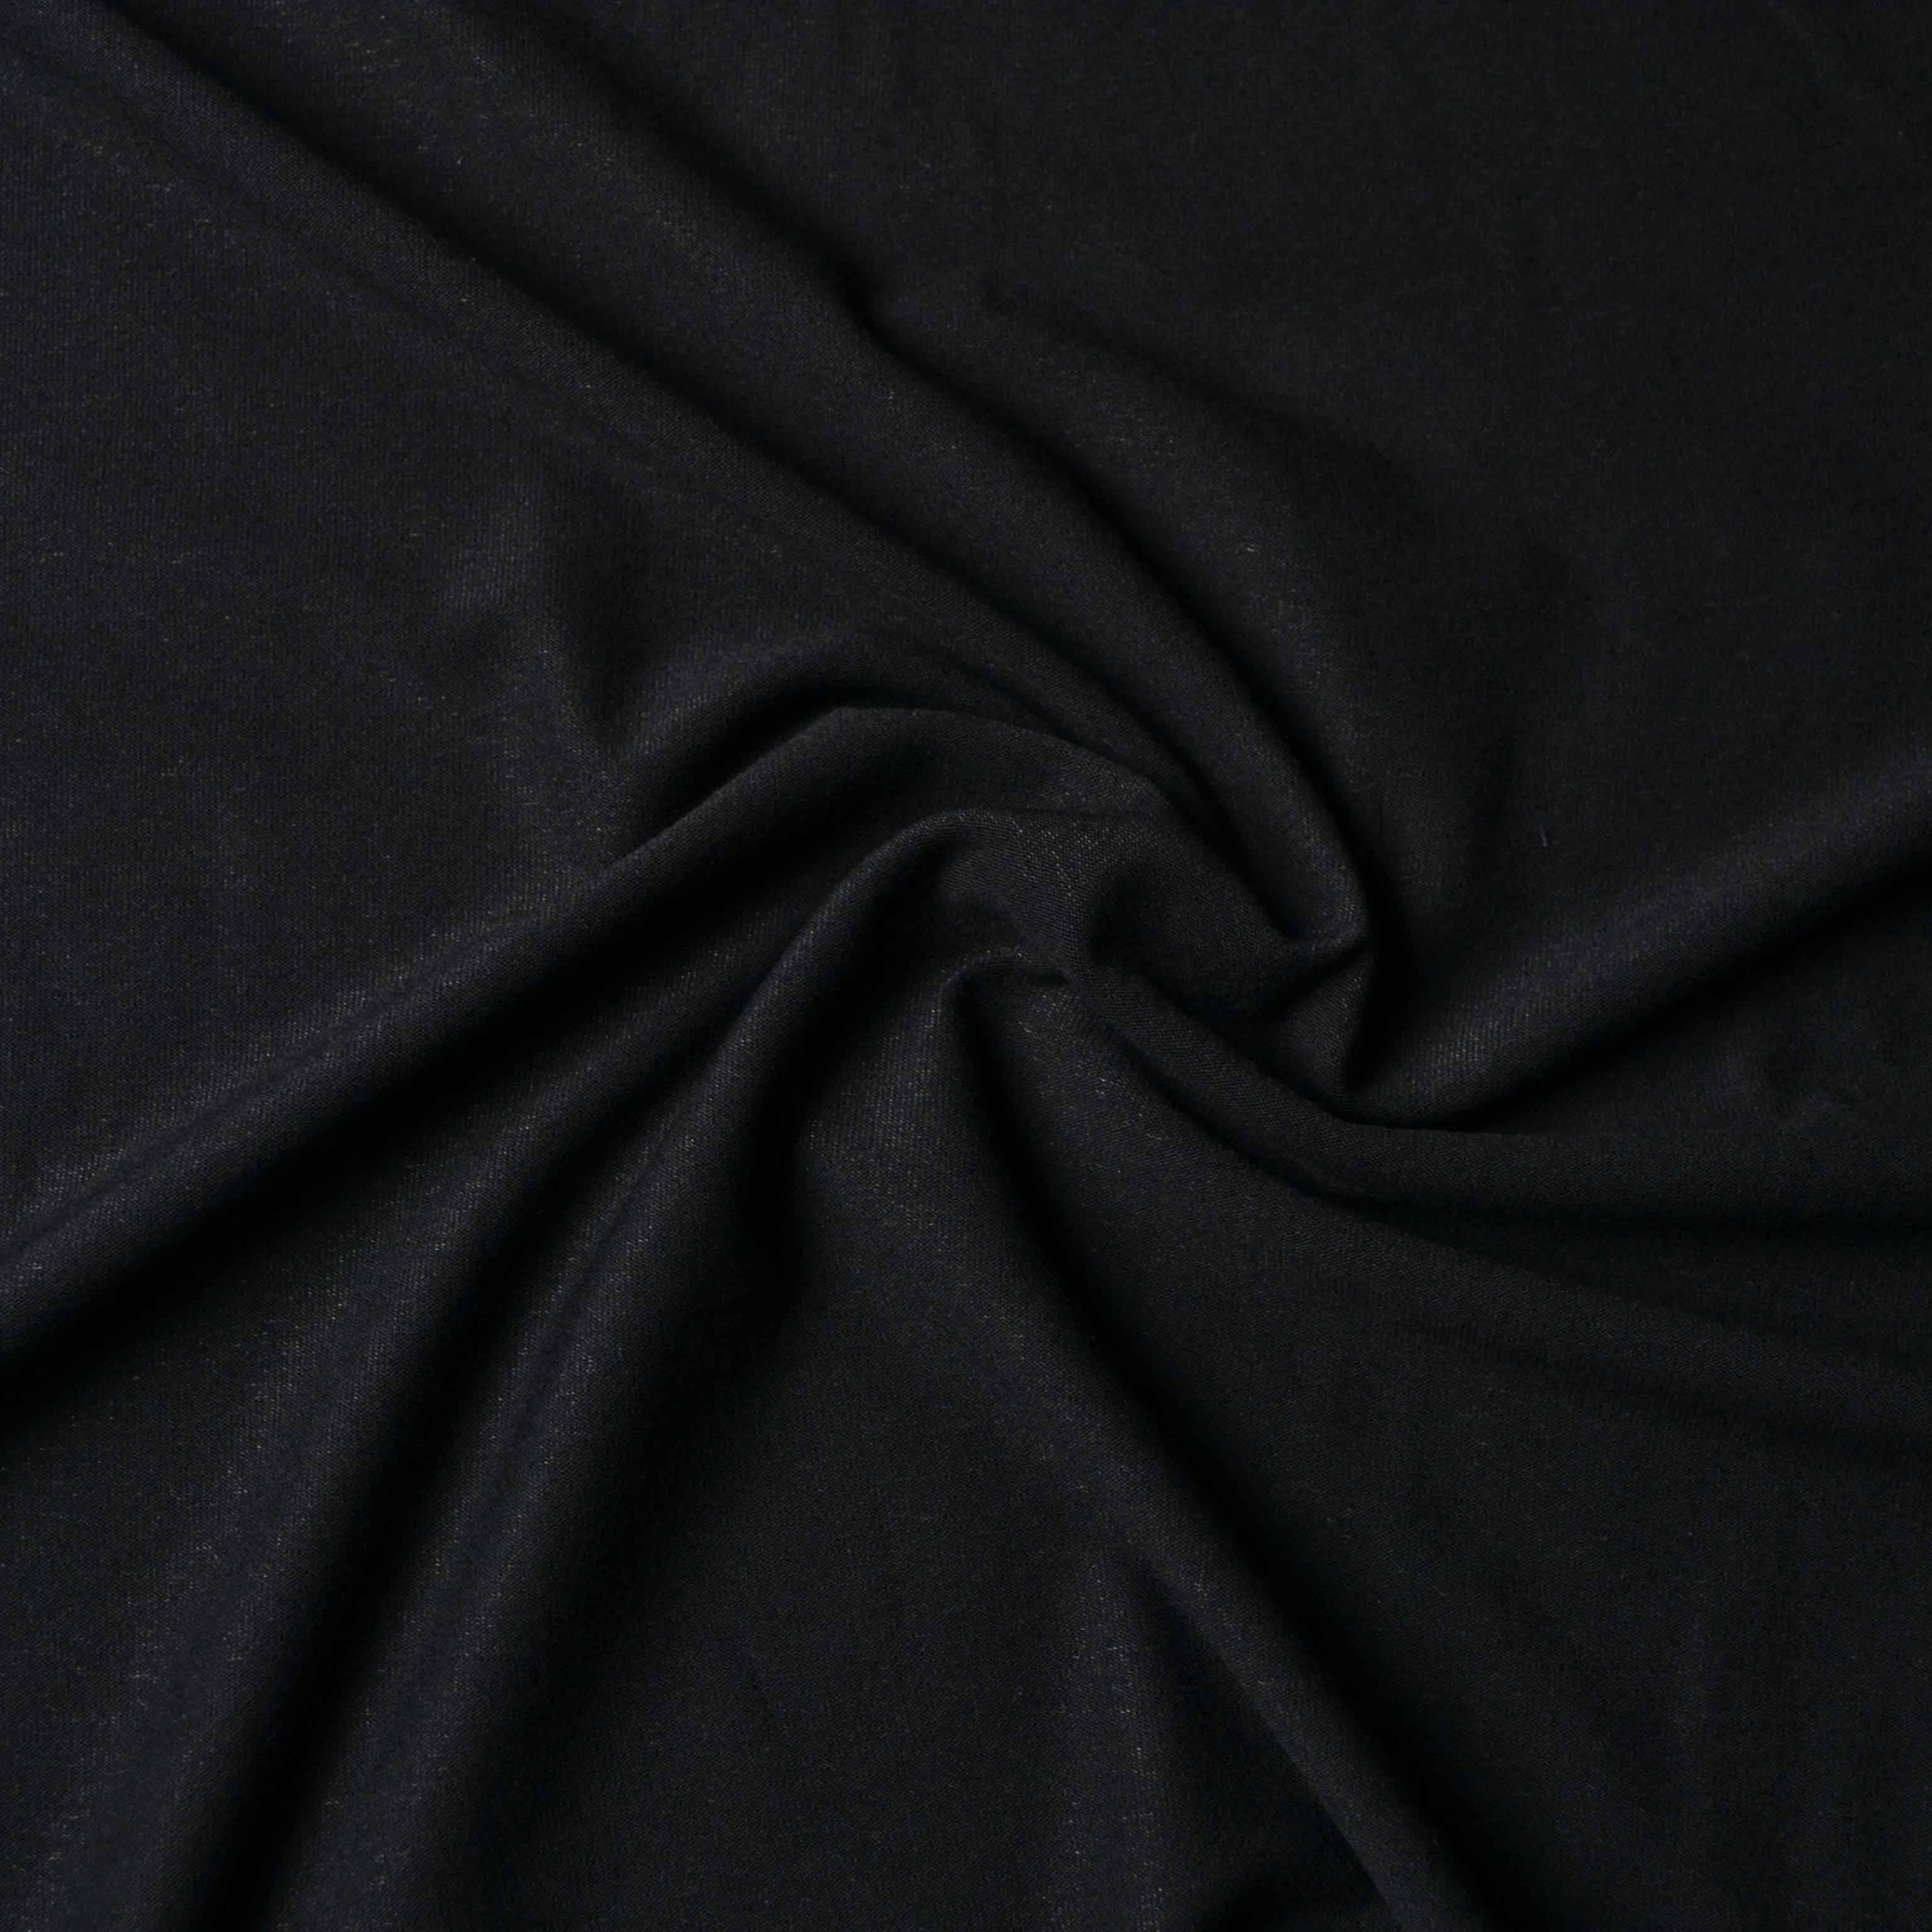 látka-viskózový-úplet-oskar-černý